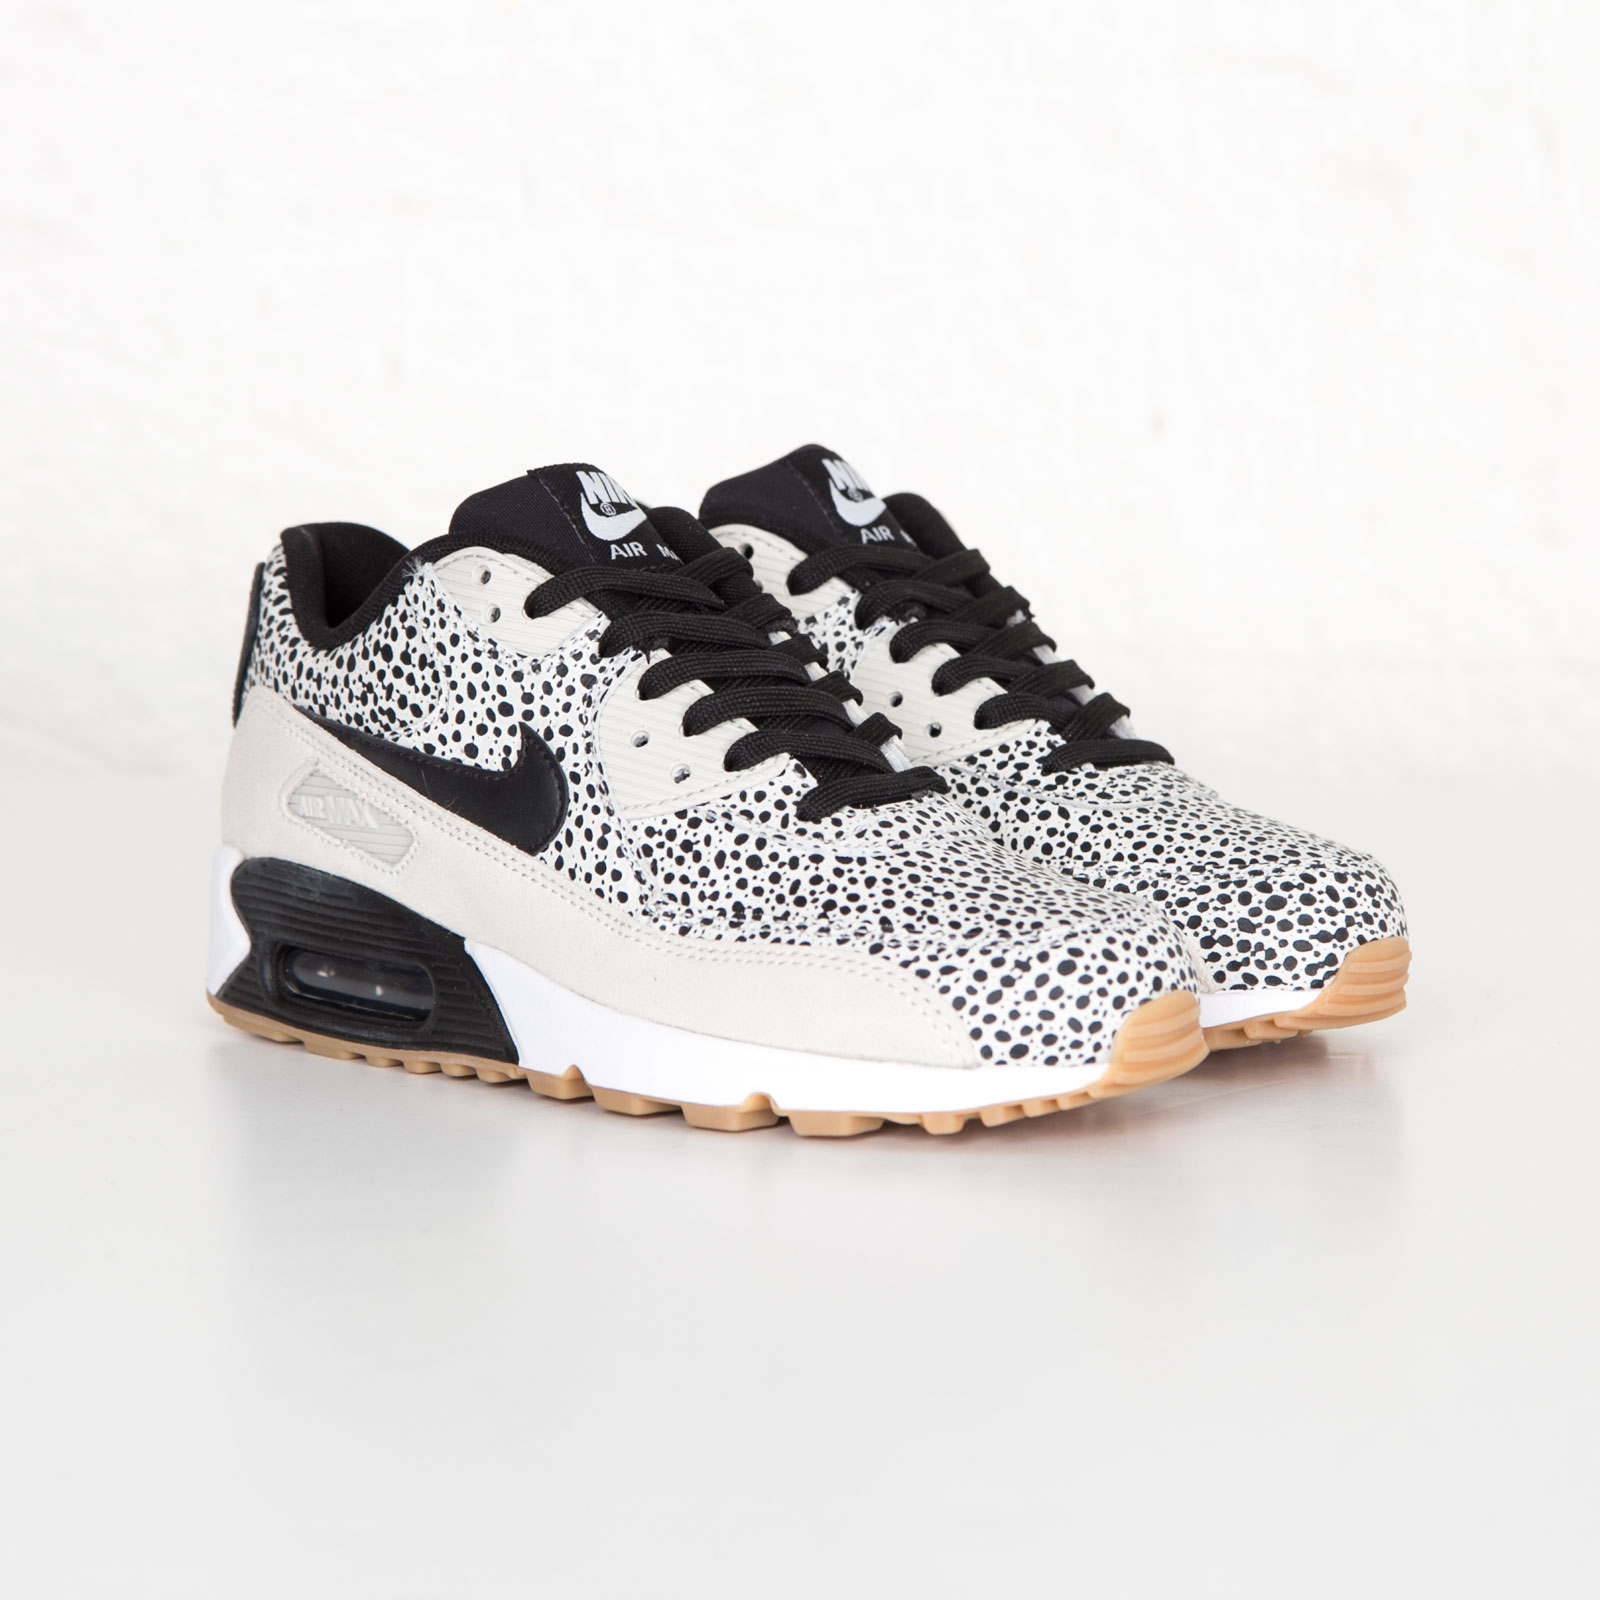 71ce7858d44a Nike Wmns Air Max 90 Premium - 443817-102 - Sneakersnstuff ...